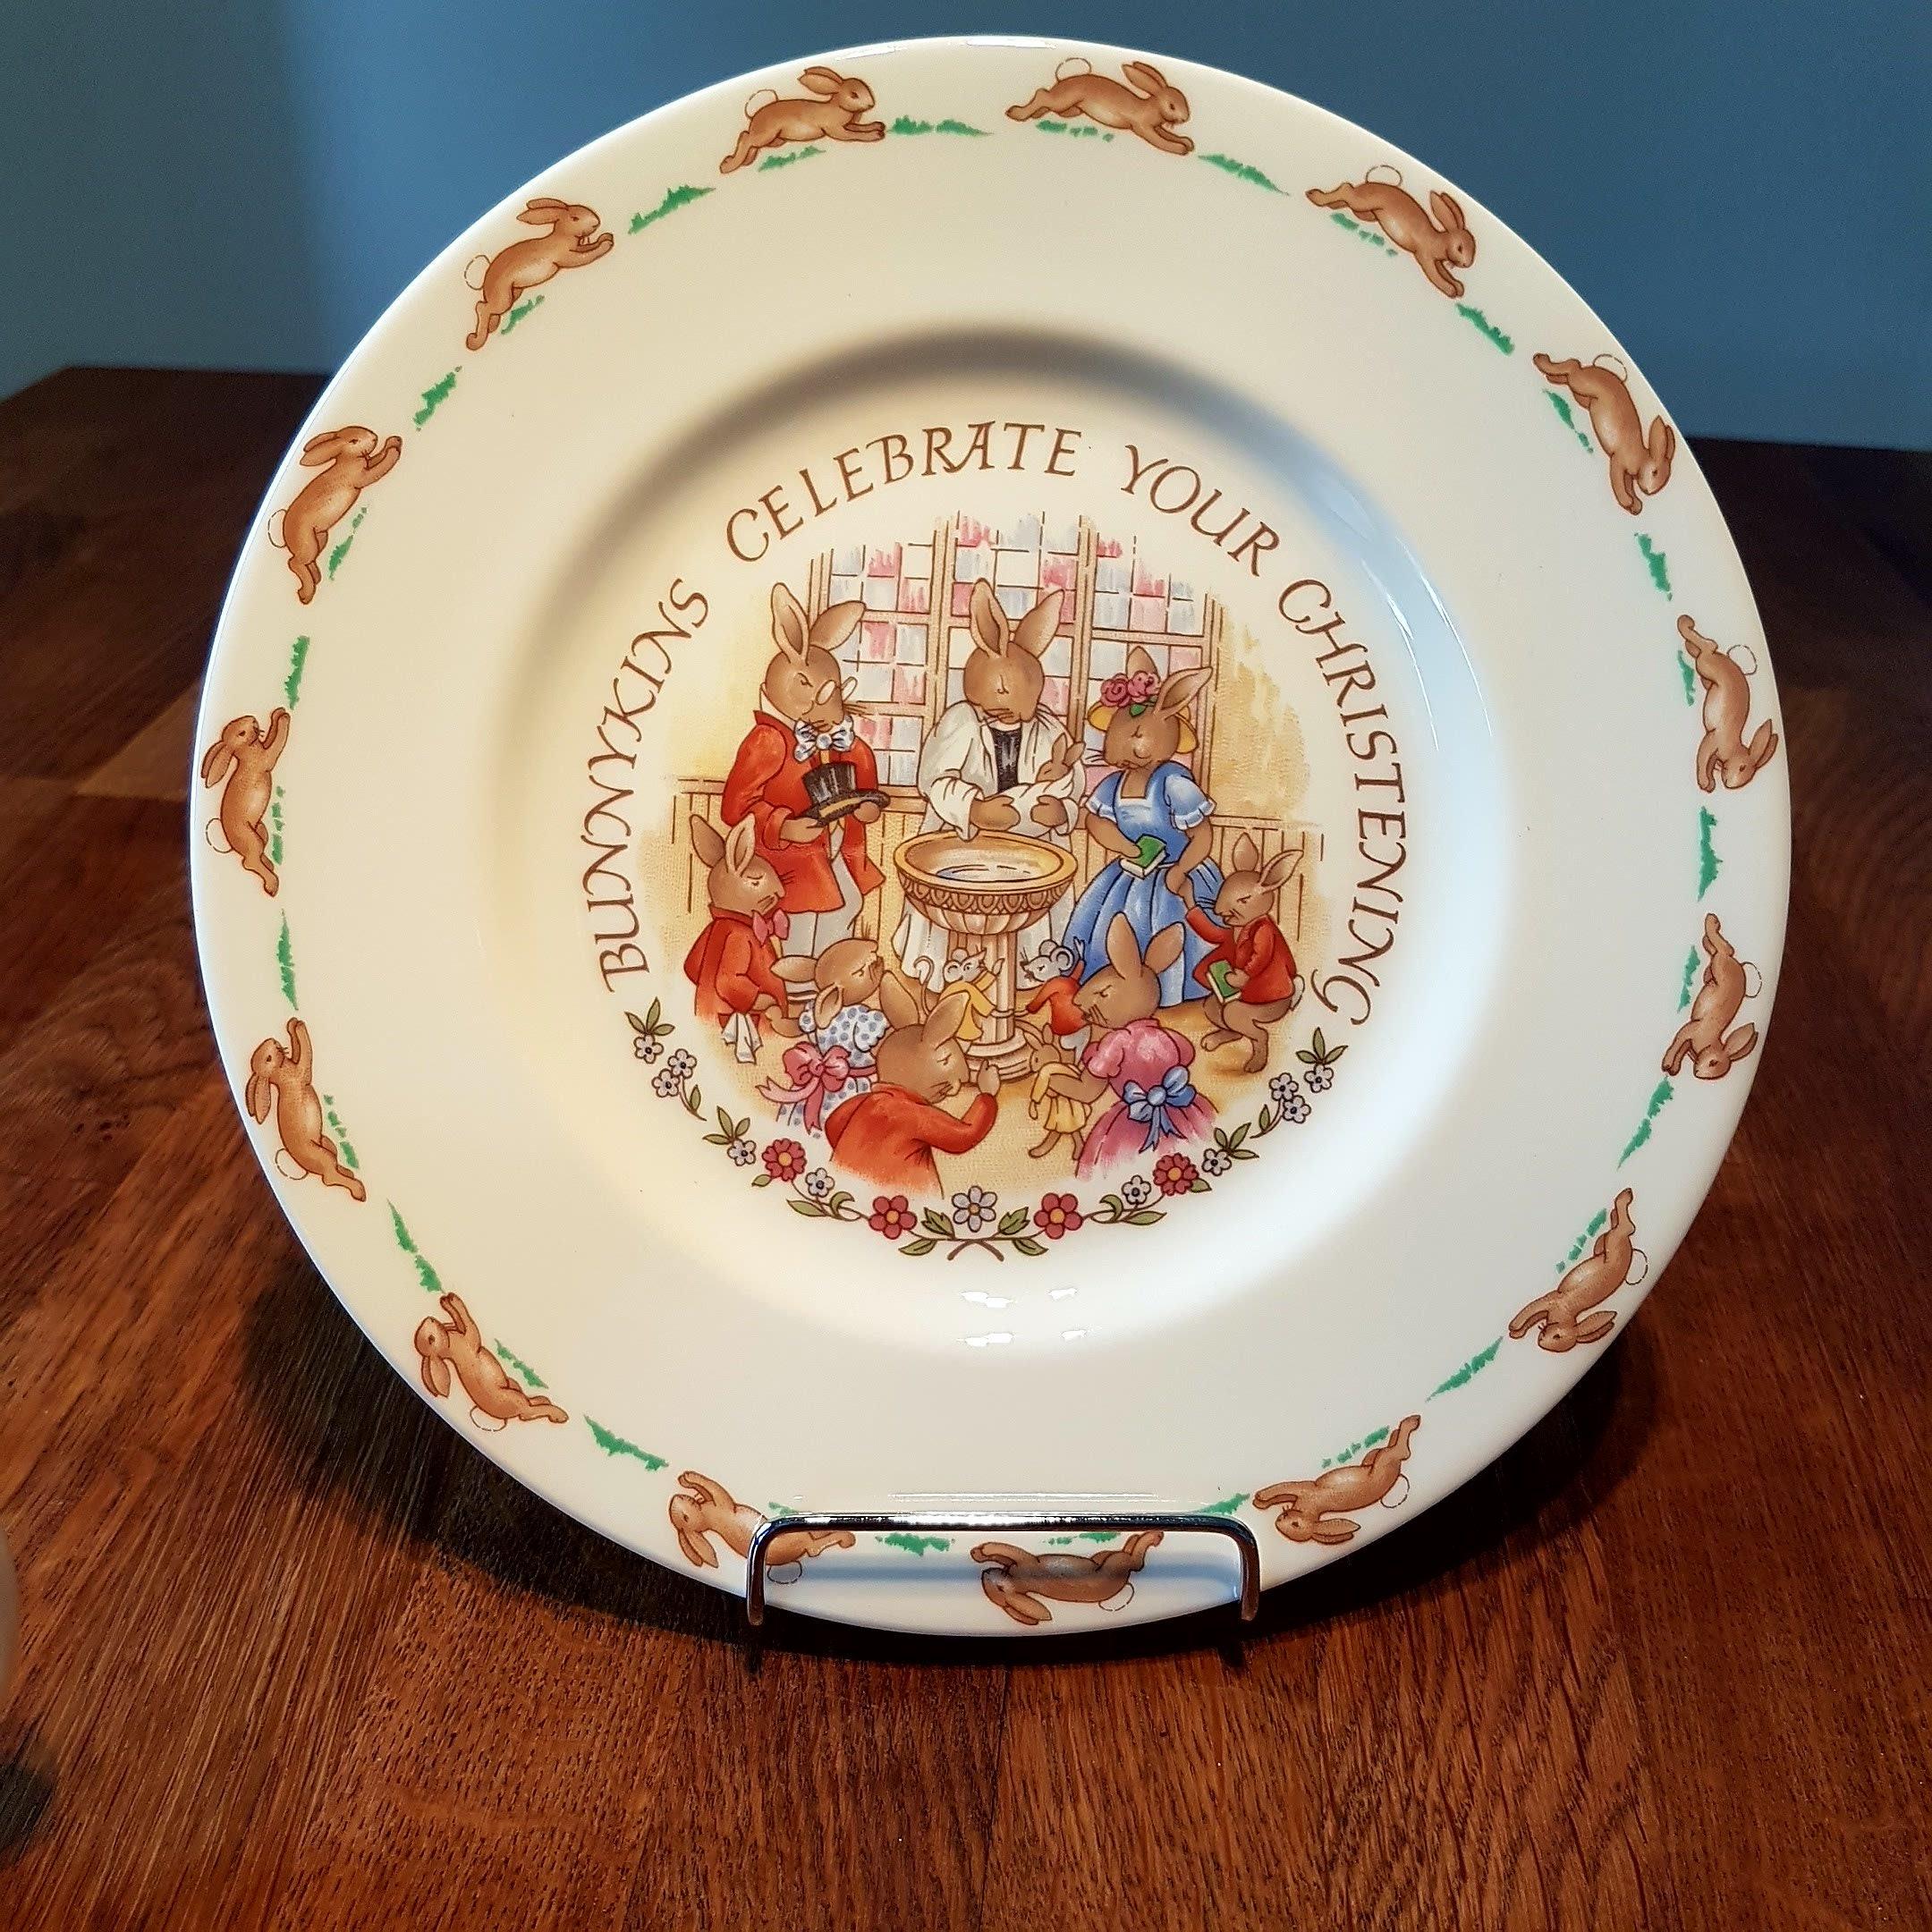 Royal Doulton Bunnykins Christening / Mug and Plate Set in